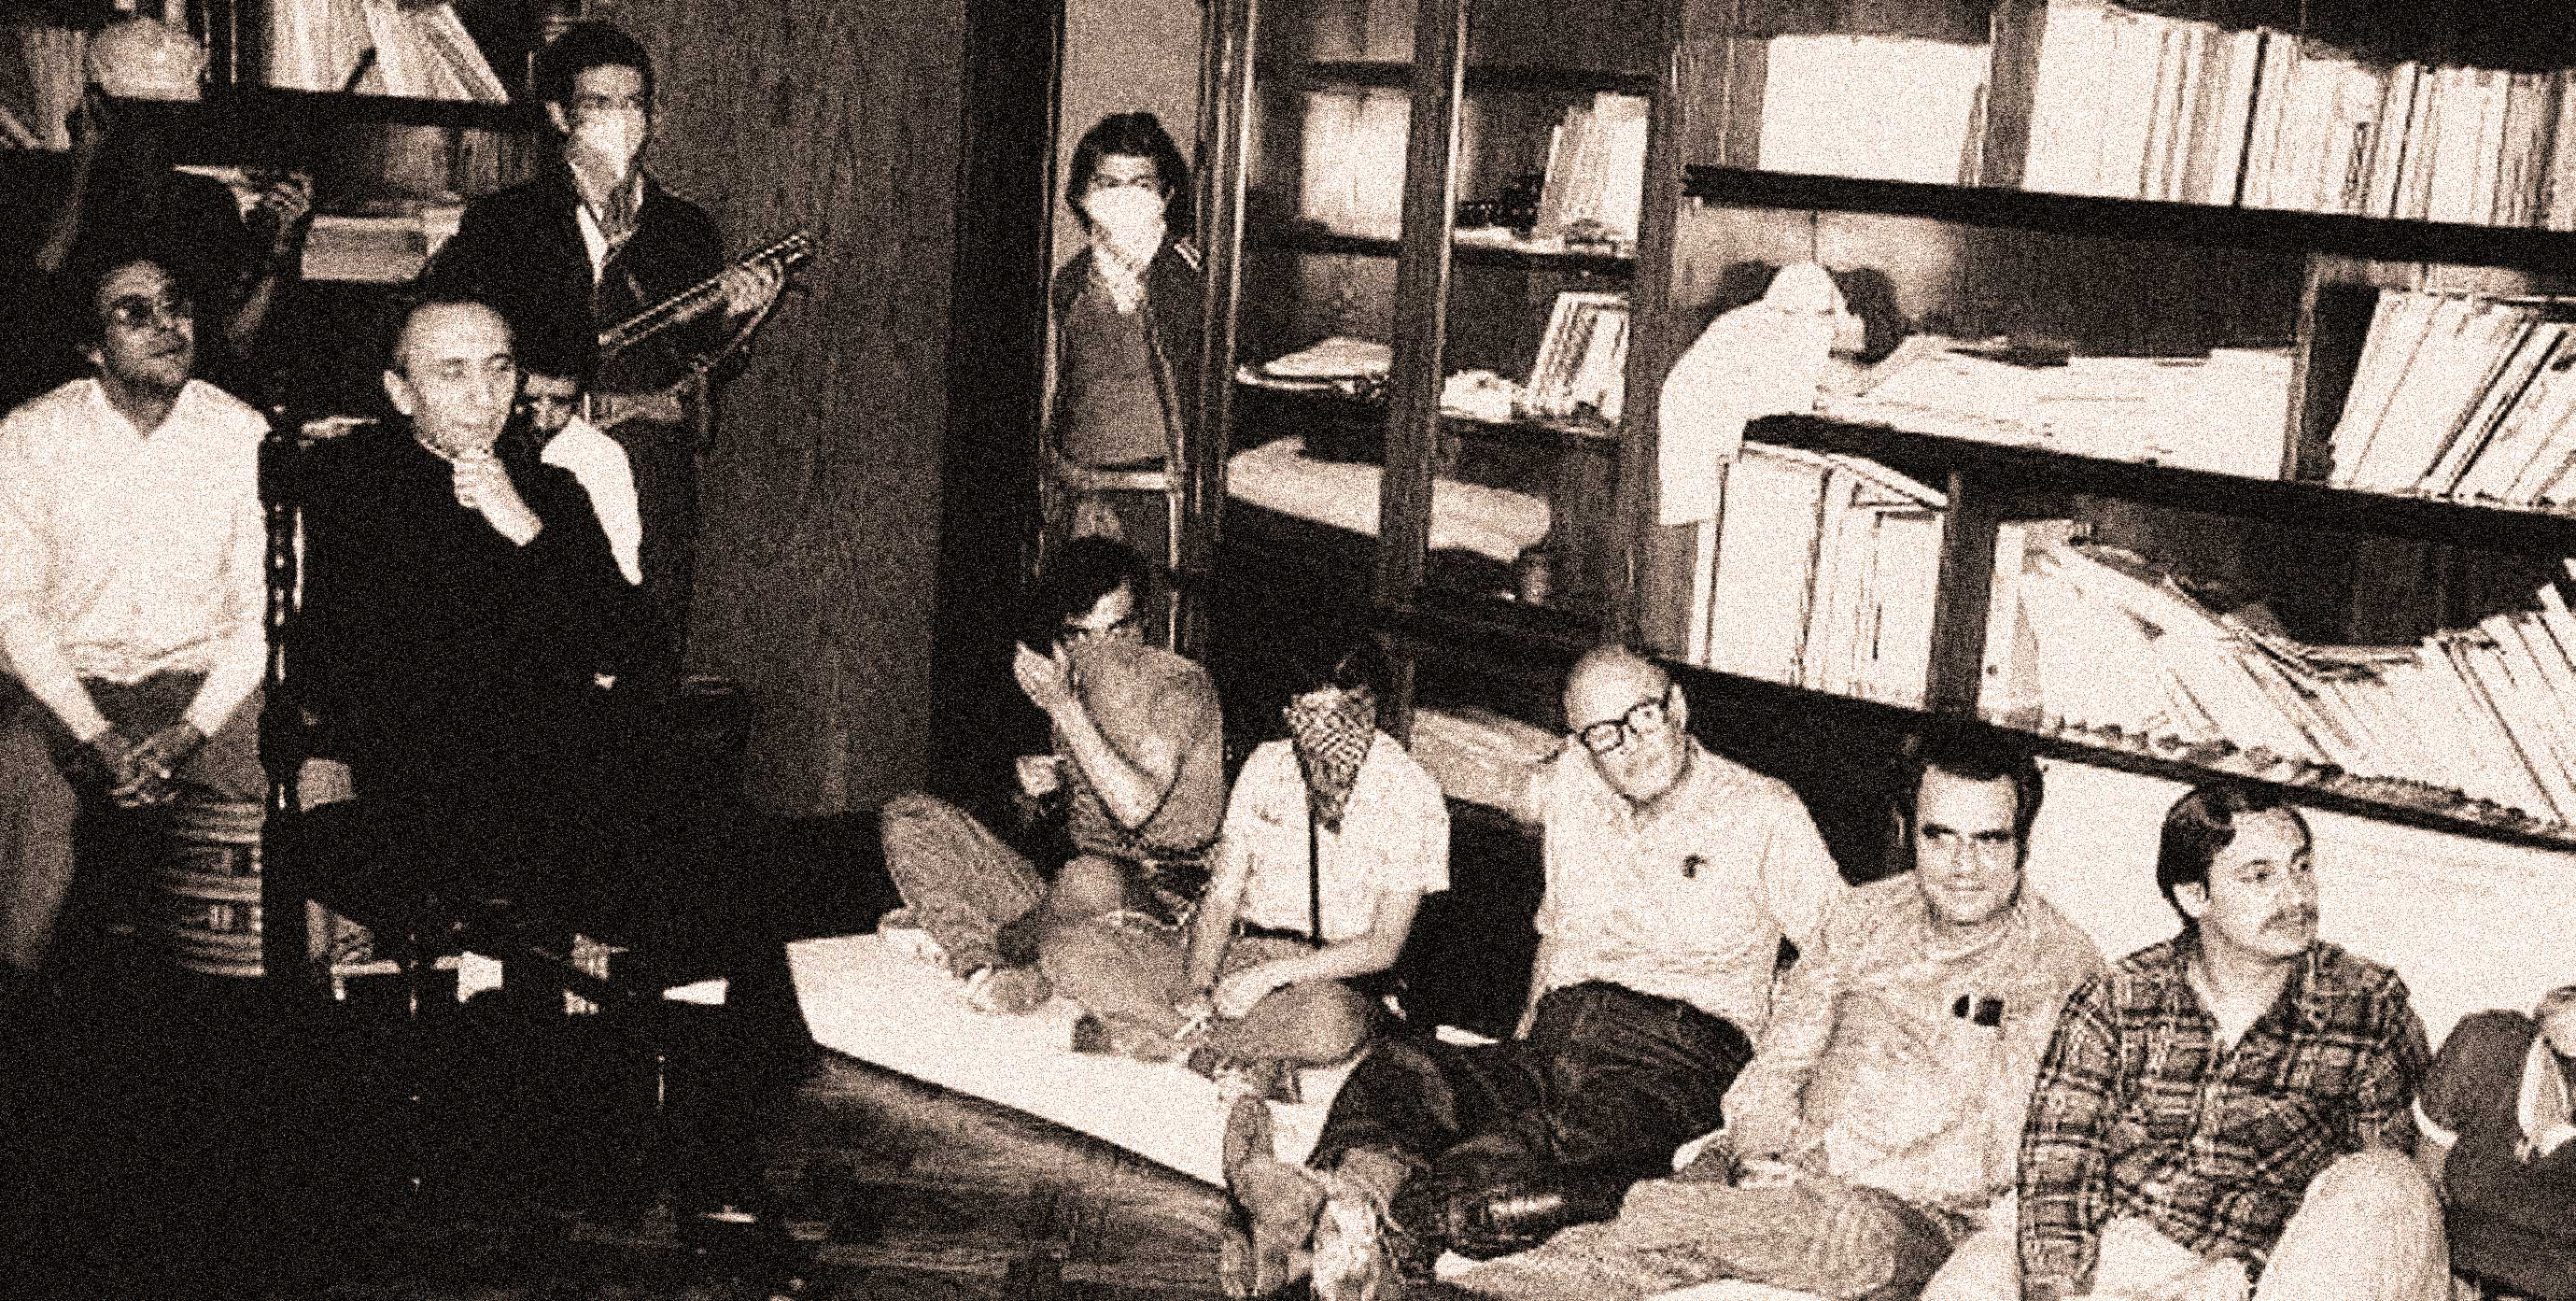 February 28, 1980 – A Hostage Drama In Bogota – Day 117 in Tehran